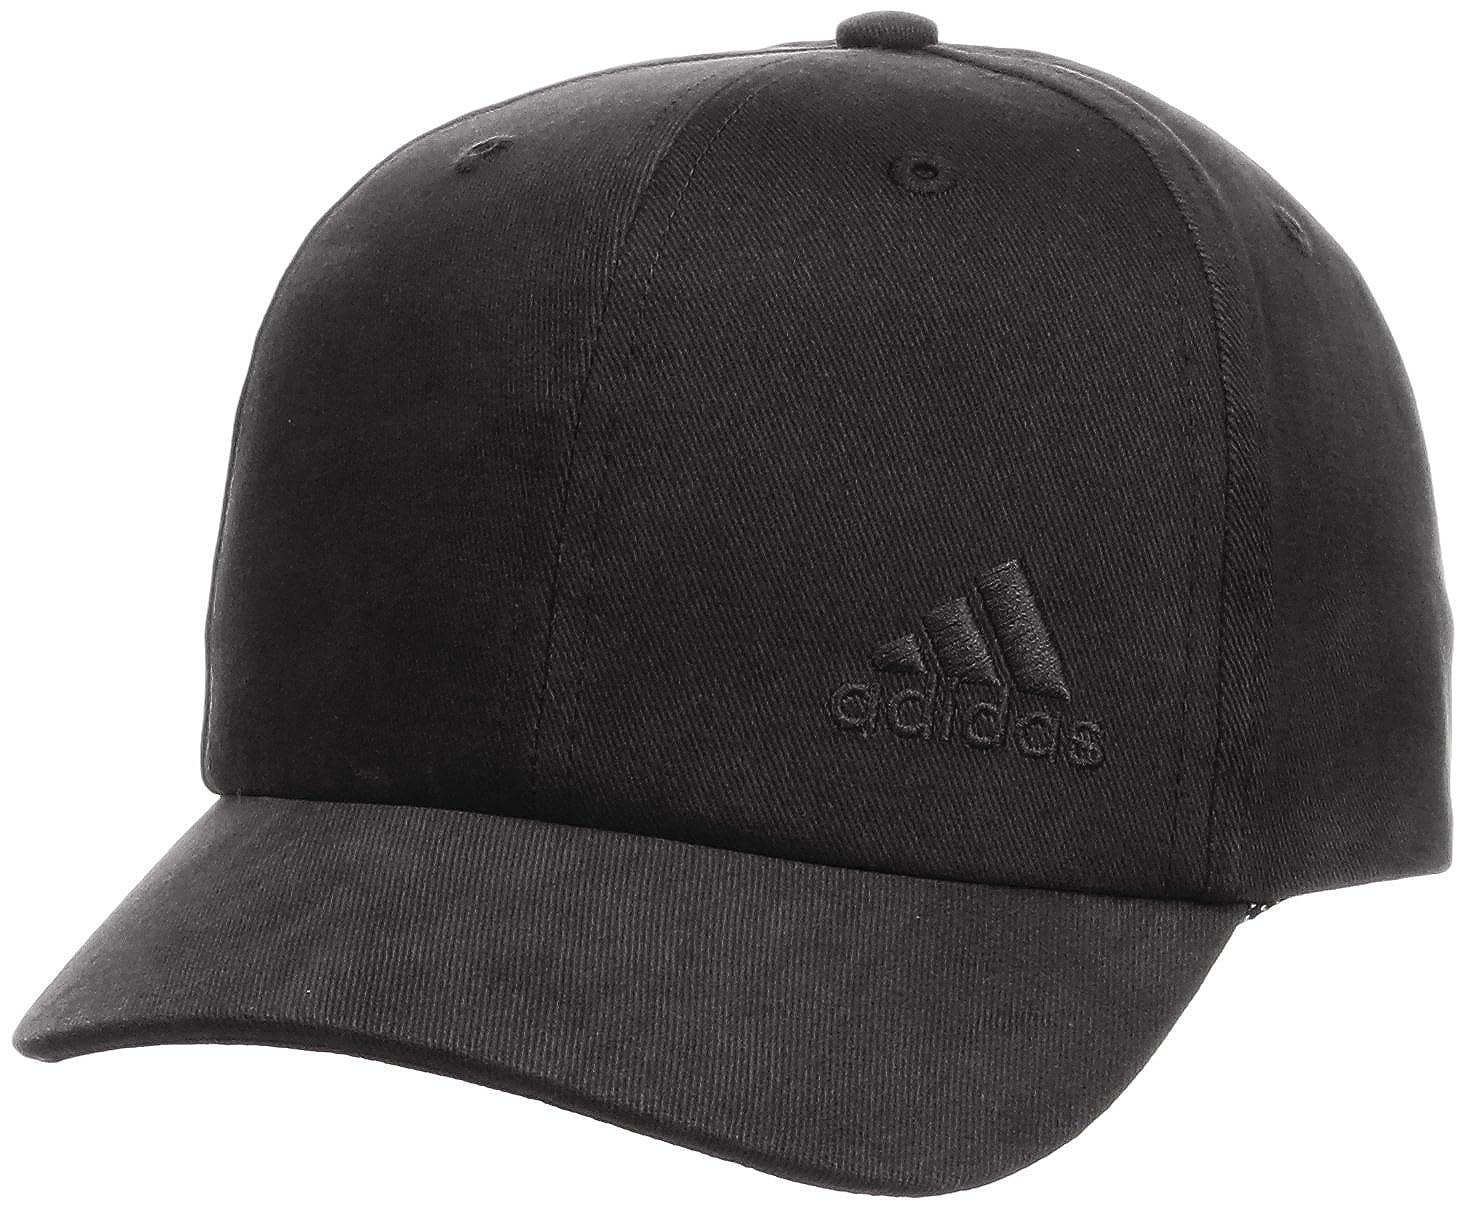 Adidas Women's Six-Panel Cap - Black/Black/Black, Size OSFL